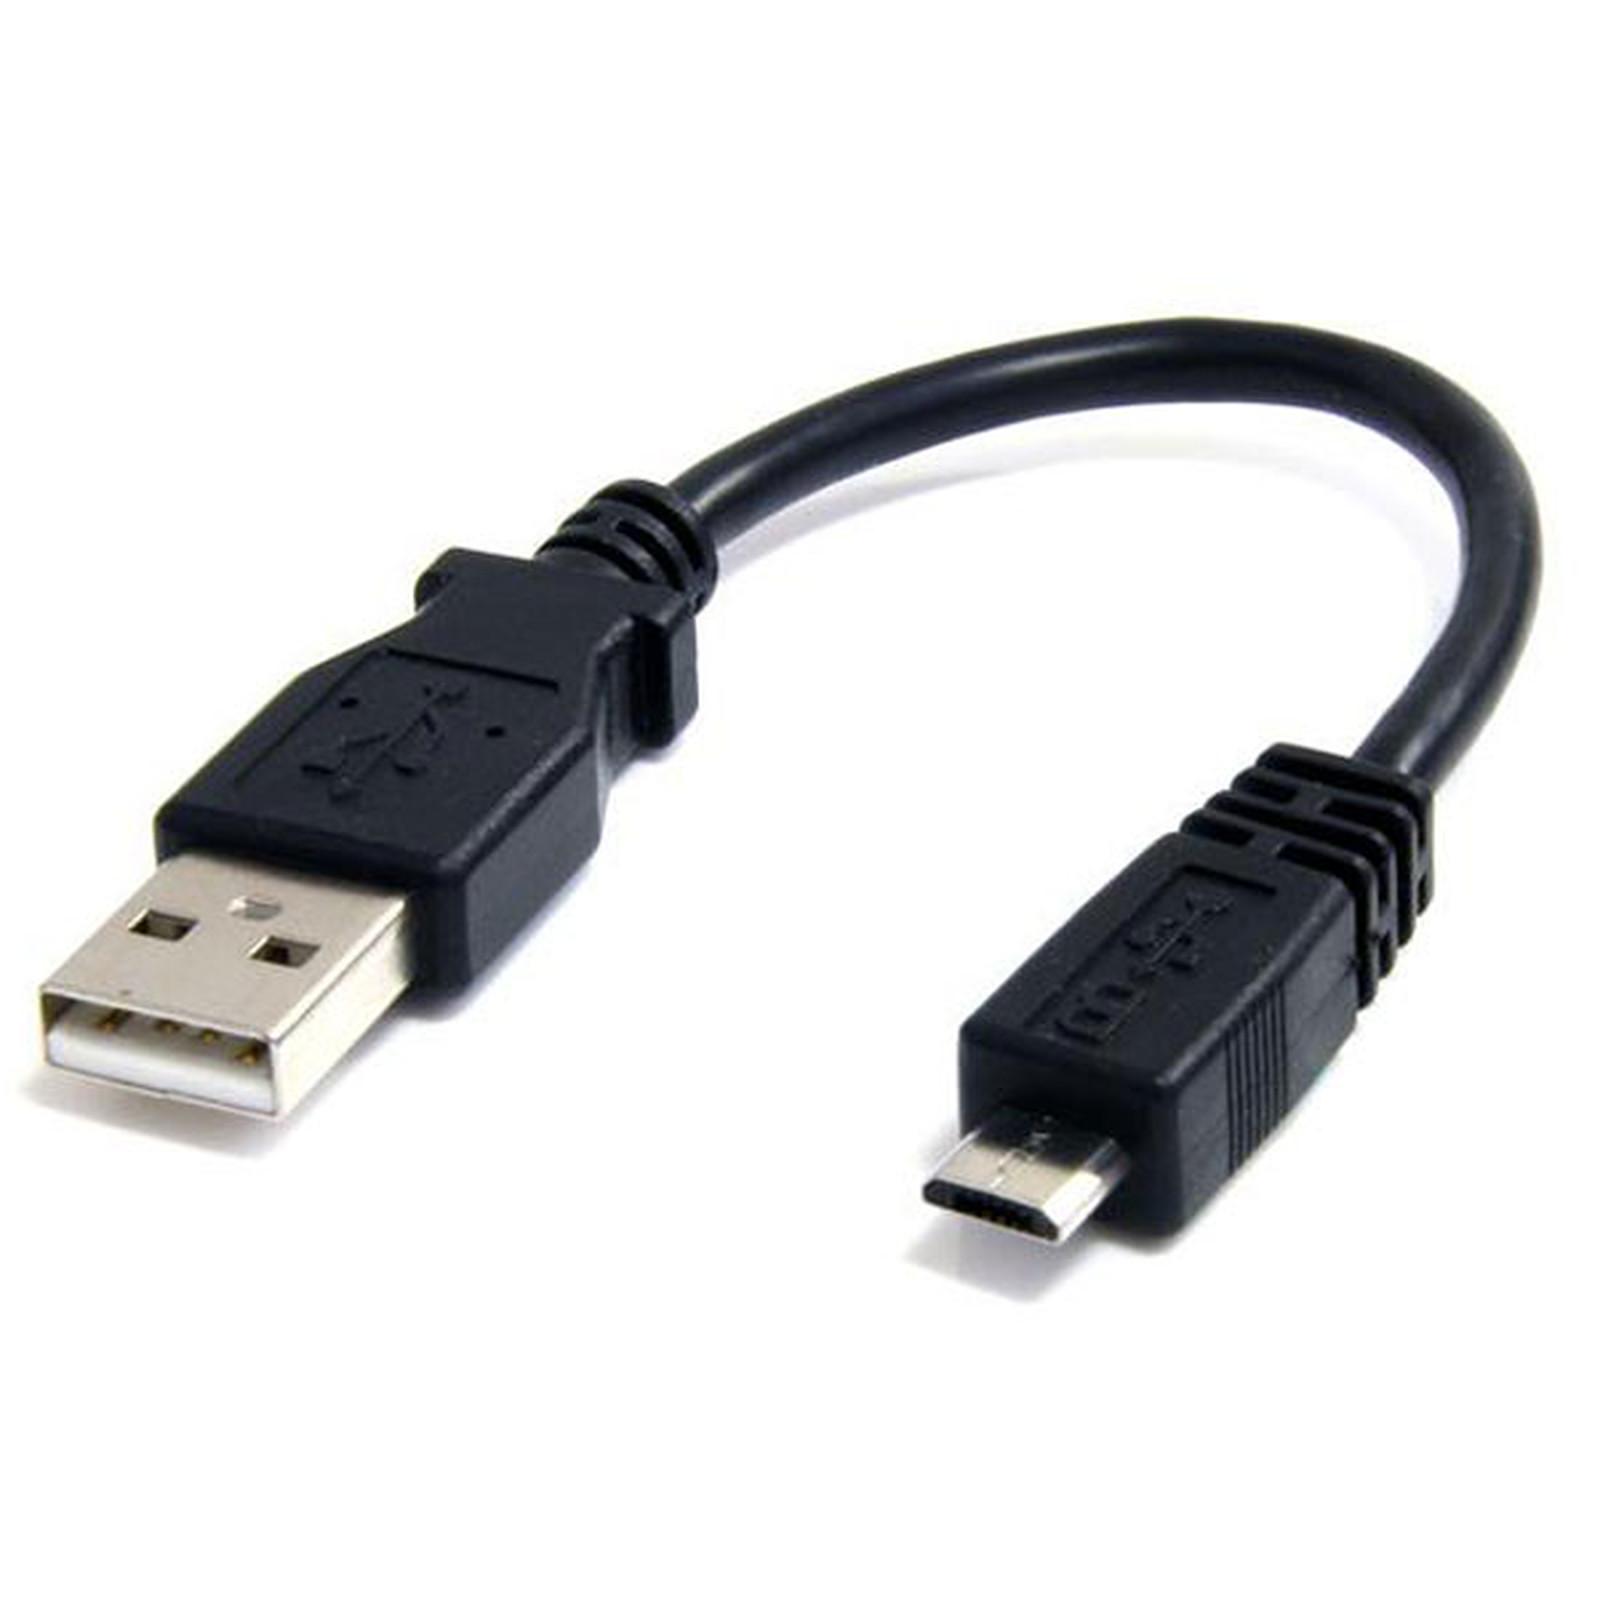 Startech Com Câble Micro Usb A Vers Micro Usb B Usb 2 0 15 Cm Noir Câble Adaptateur Startech Com Sur Ldlc